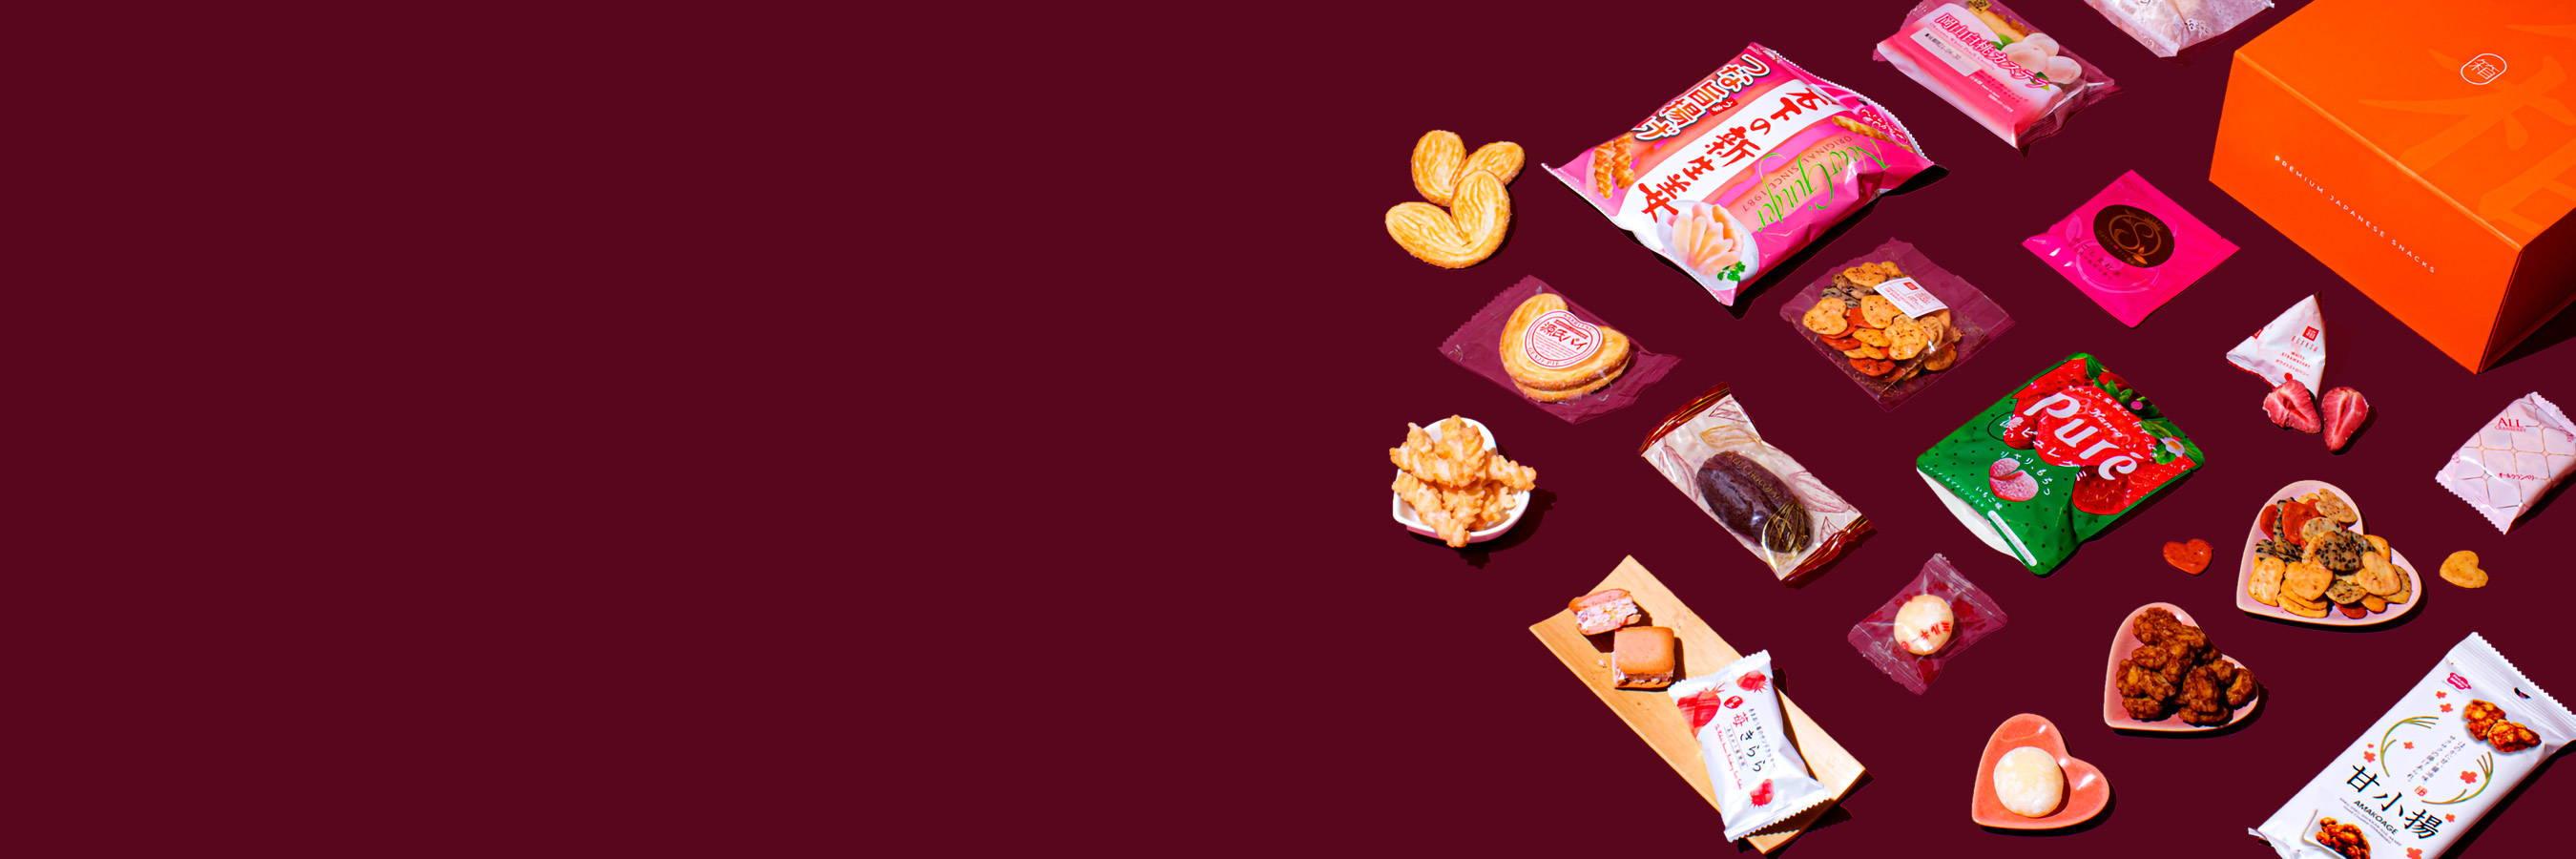 February Japanese snacks from Bokksu